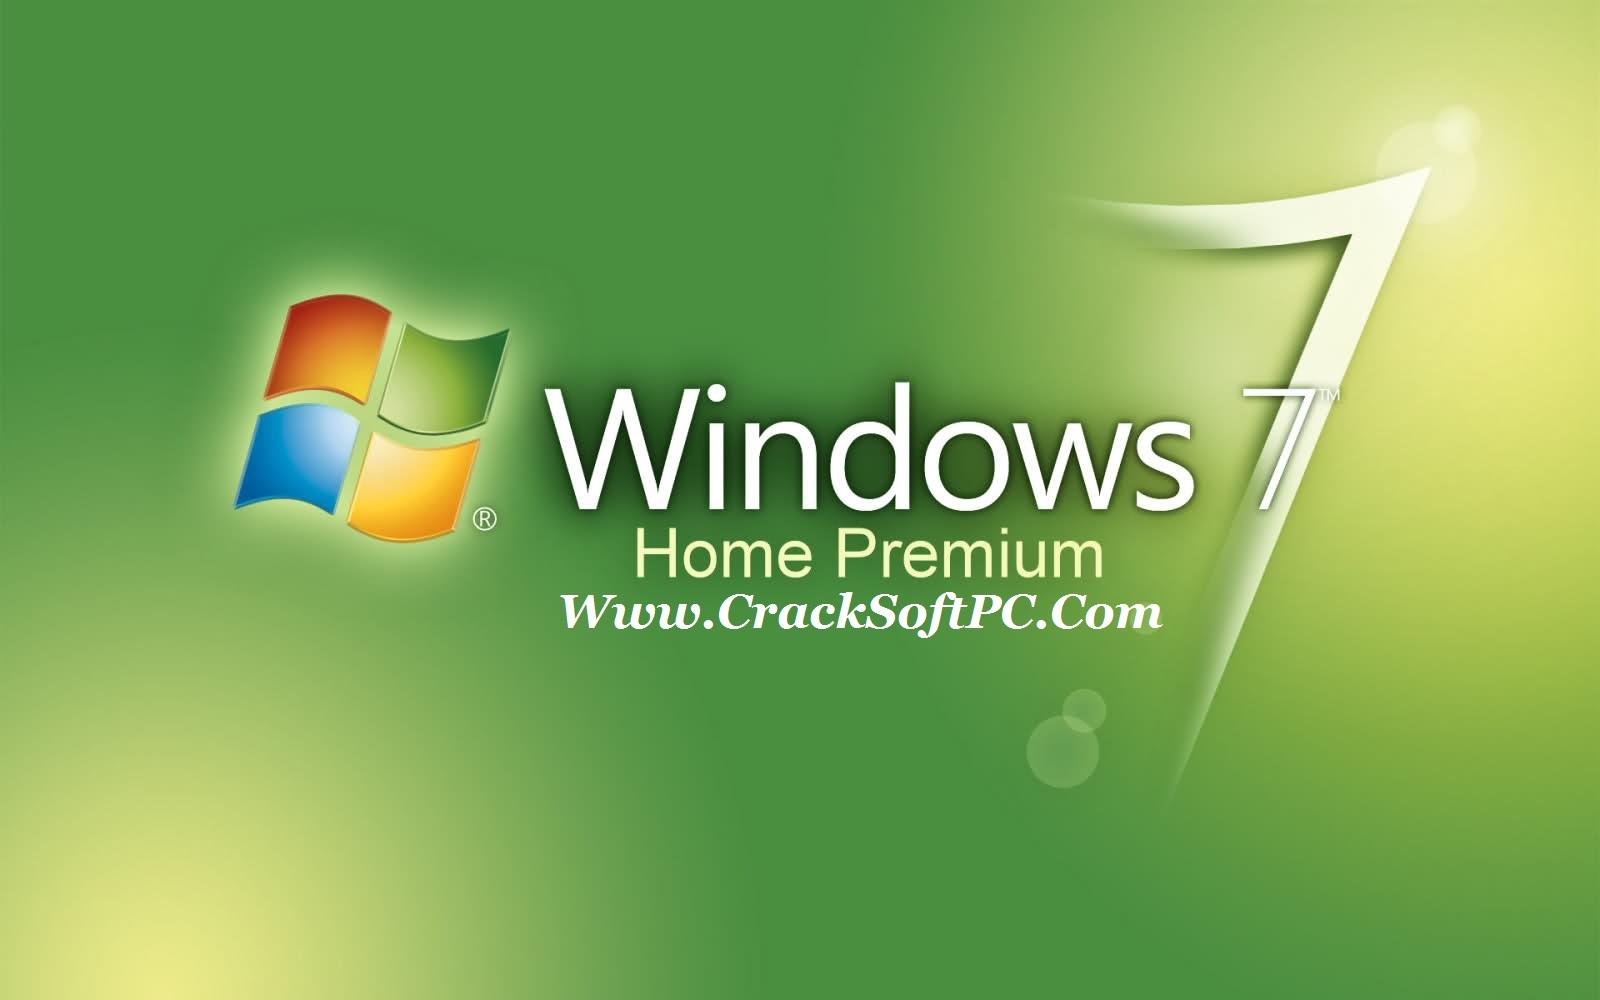 Windows 7 Home Premium 64 Bit Product Key 2017-cover-CrackSoftPC